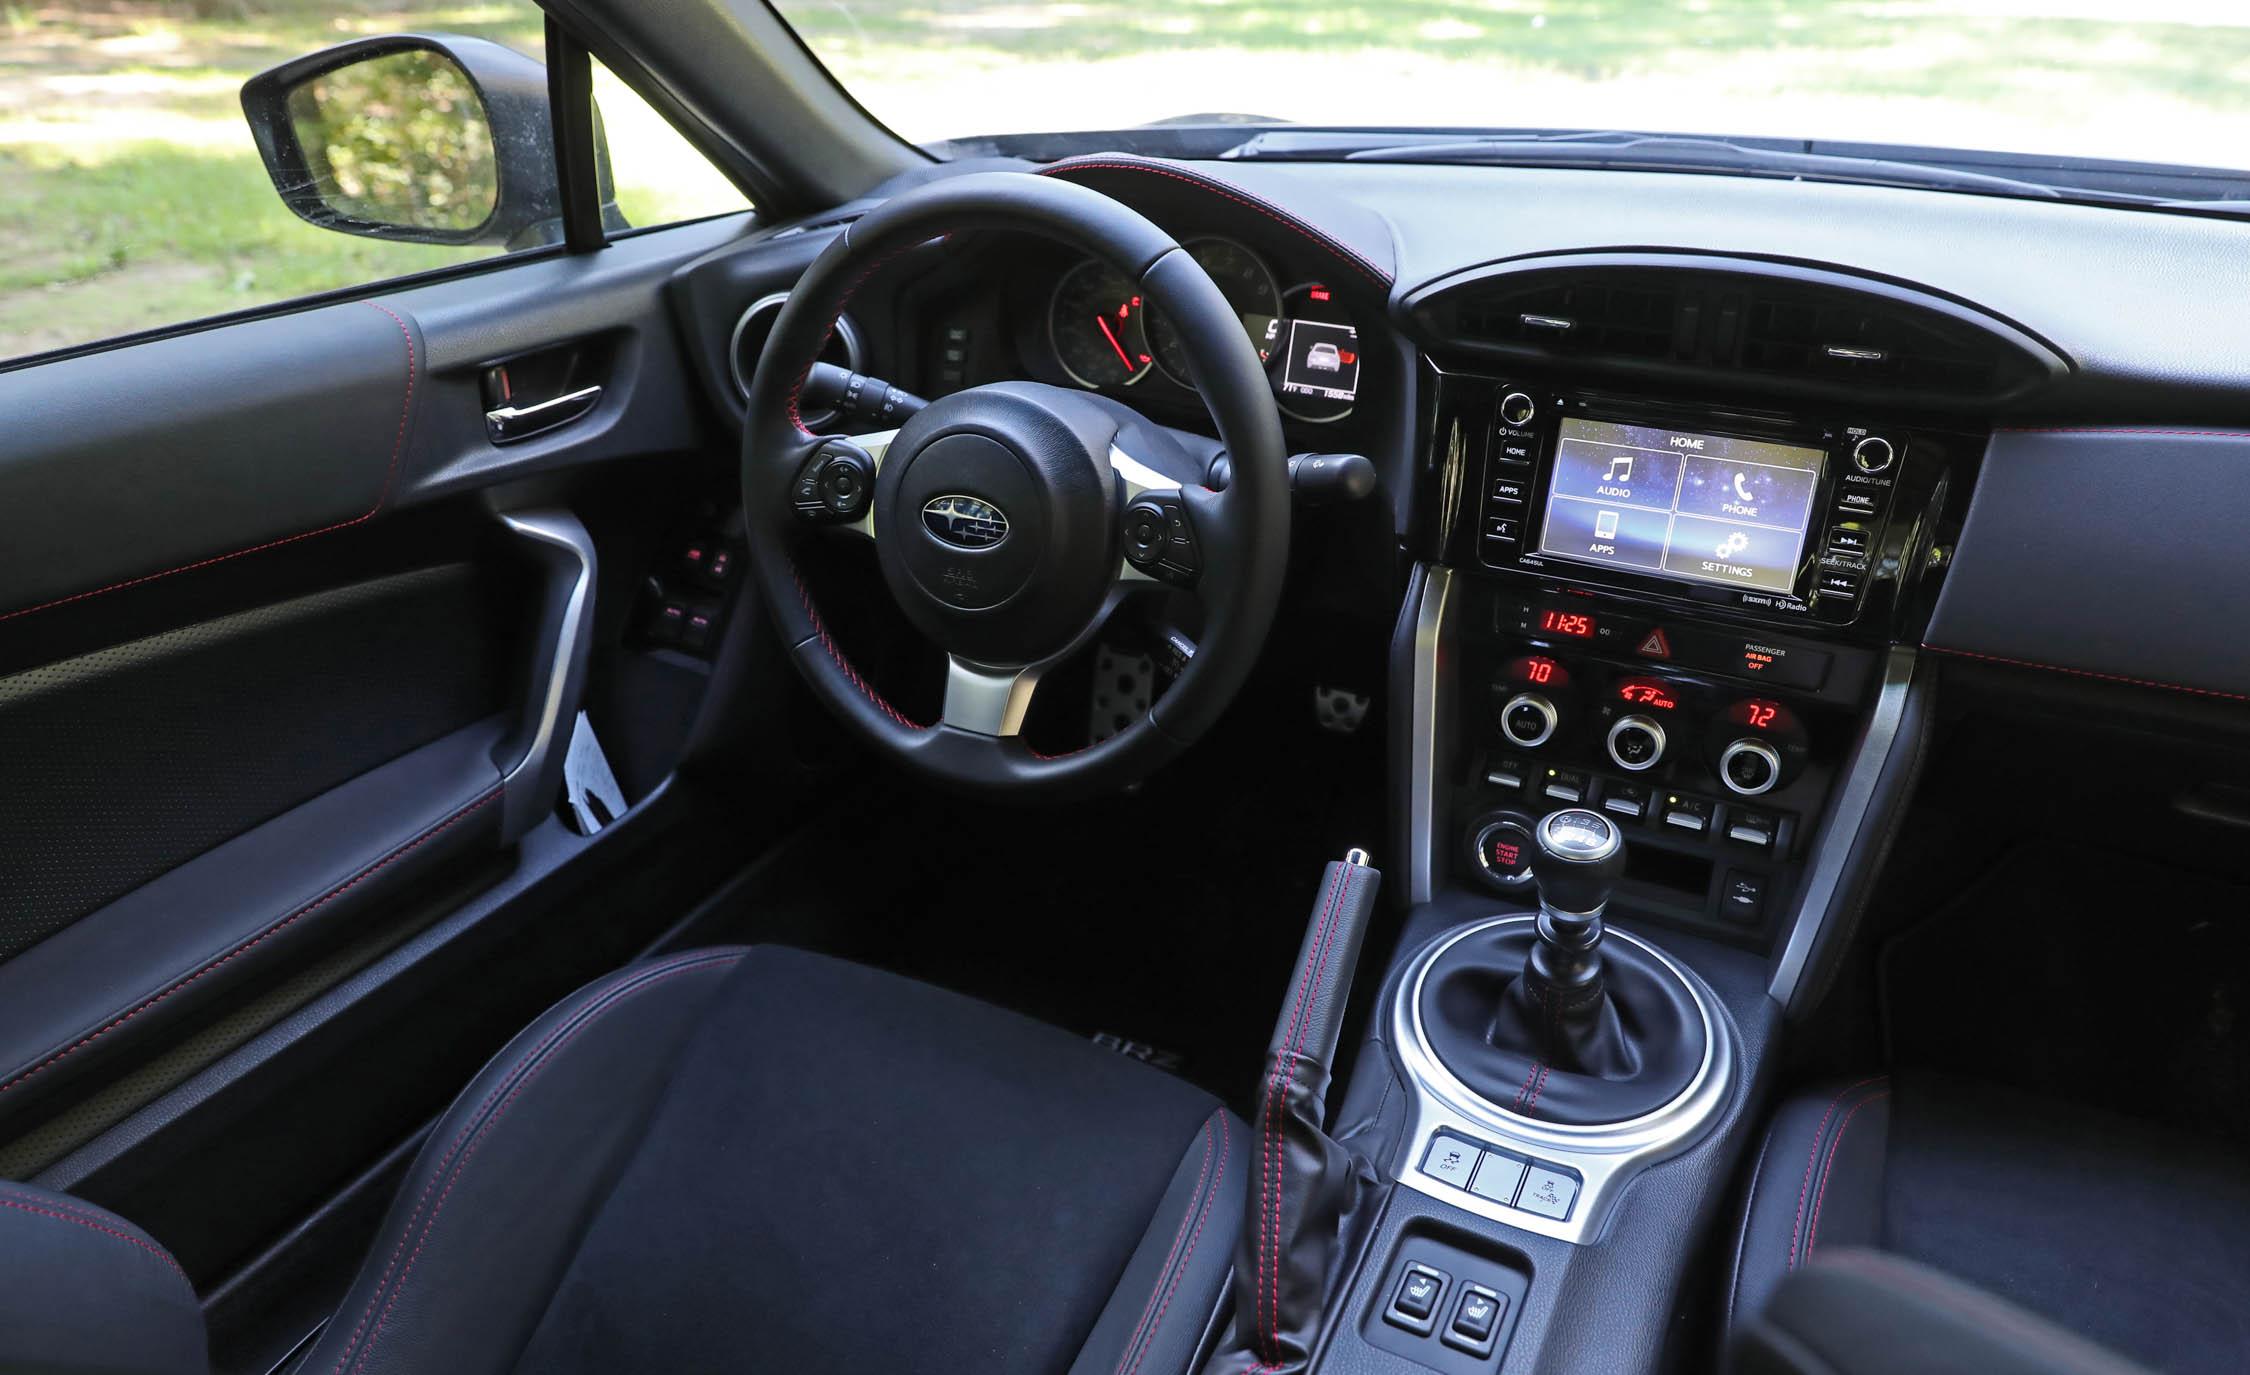 2017 Subaru BRZ Interior Driver Cockpit (Photo 18 of 27)